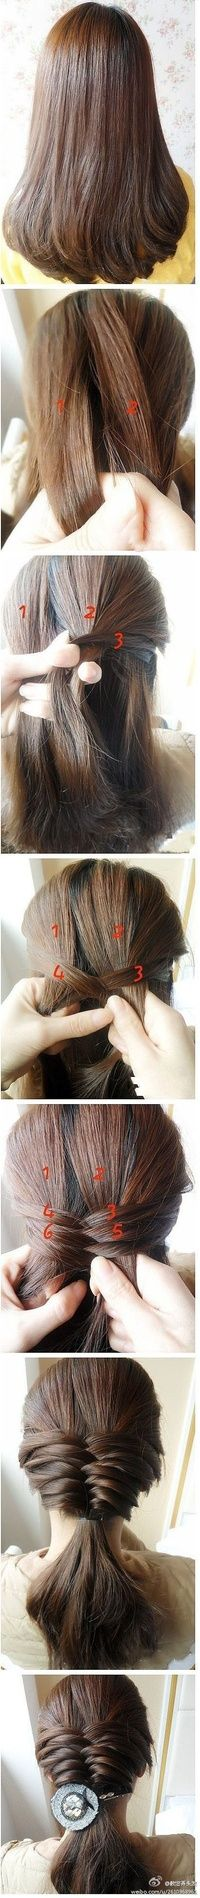 Pretty fishtail french braid ponytail how to tutorial